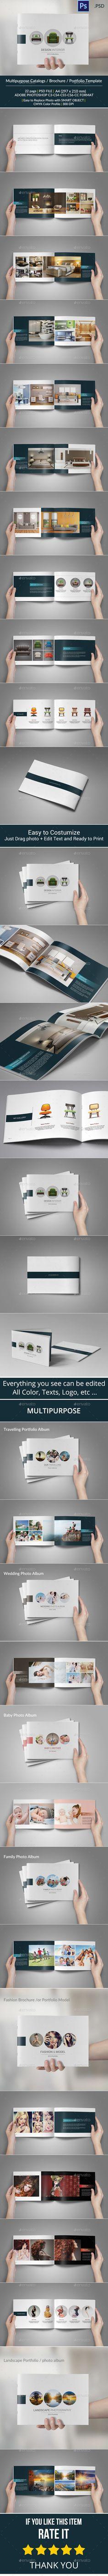 Multipurpose Catalogs / Brochure / Portfolio Template #design Download: http://graphicriver.net/item/multipurpose-catalogs-brochure-portfolio/10010547?ref=ksioks